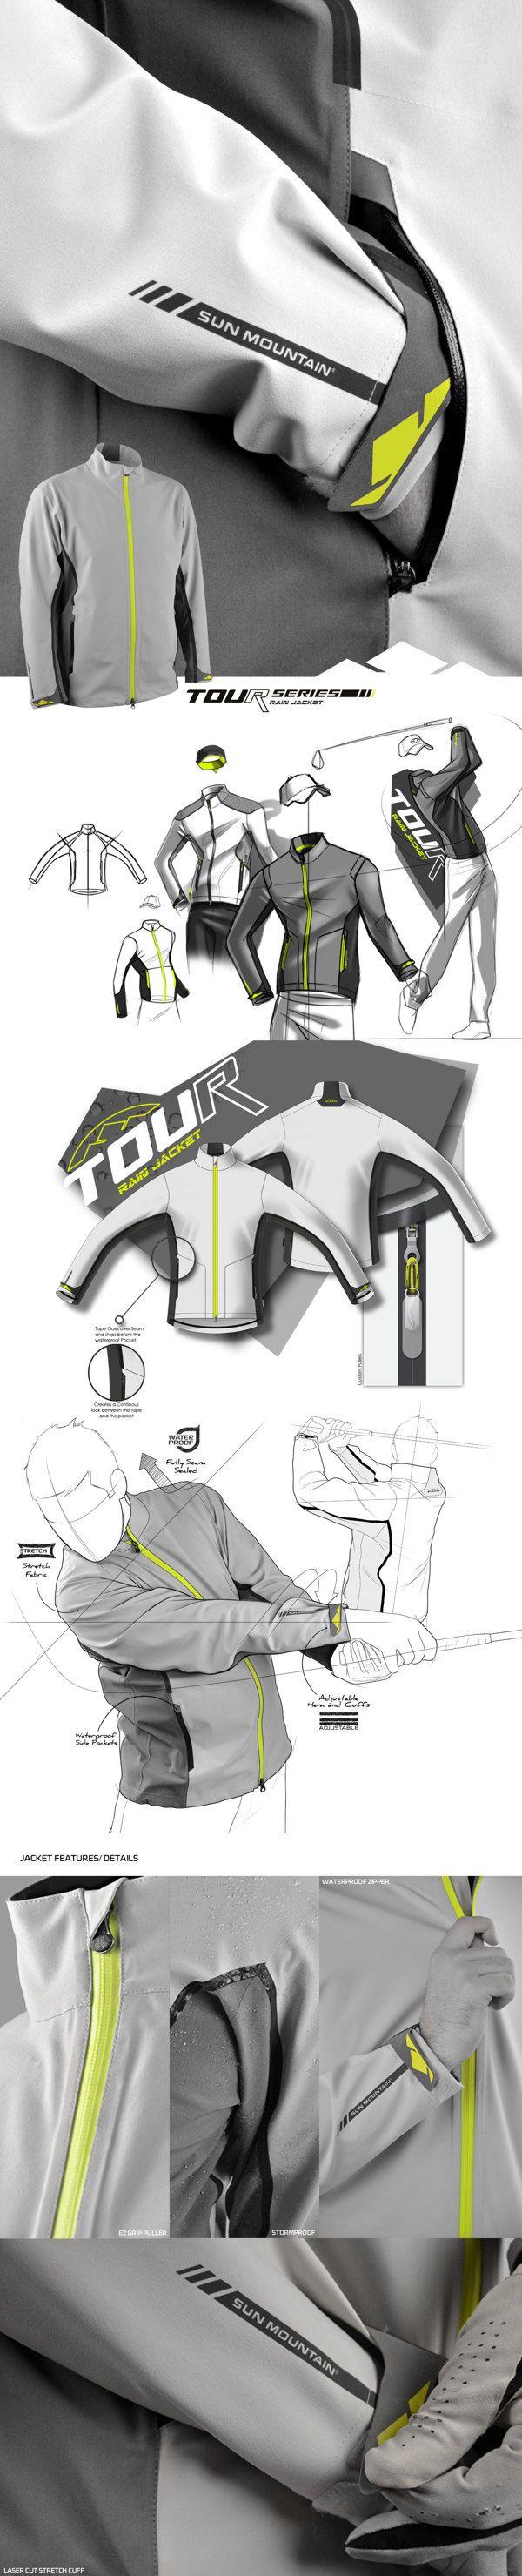 Tour Series Jacket by IOTA Design, via Behance